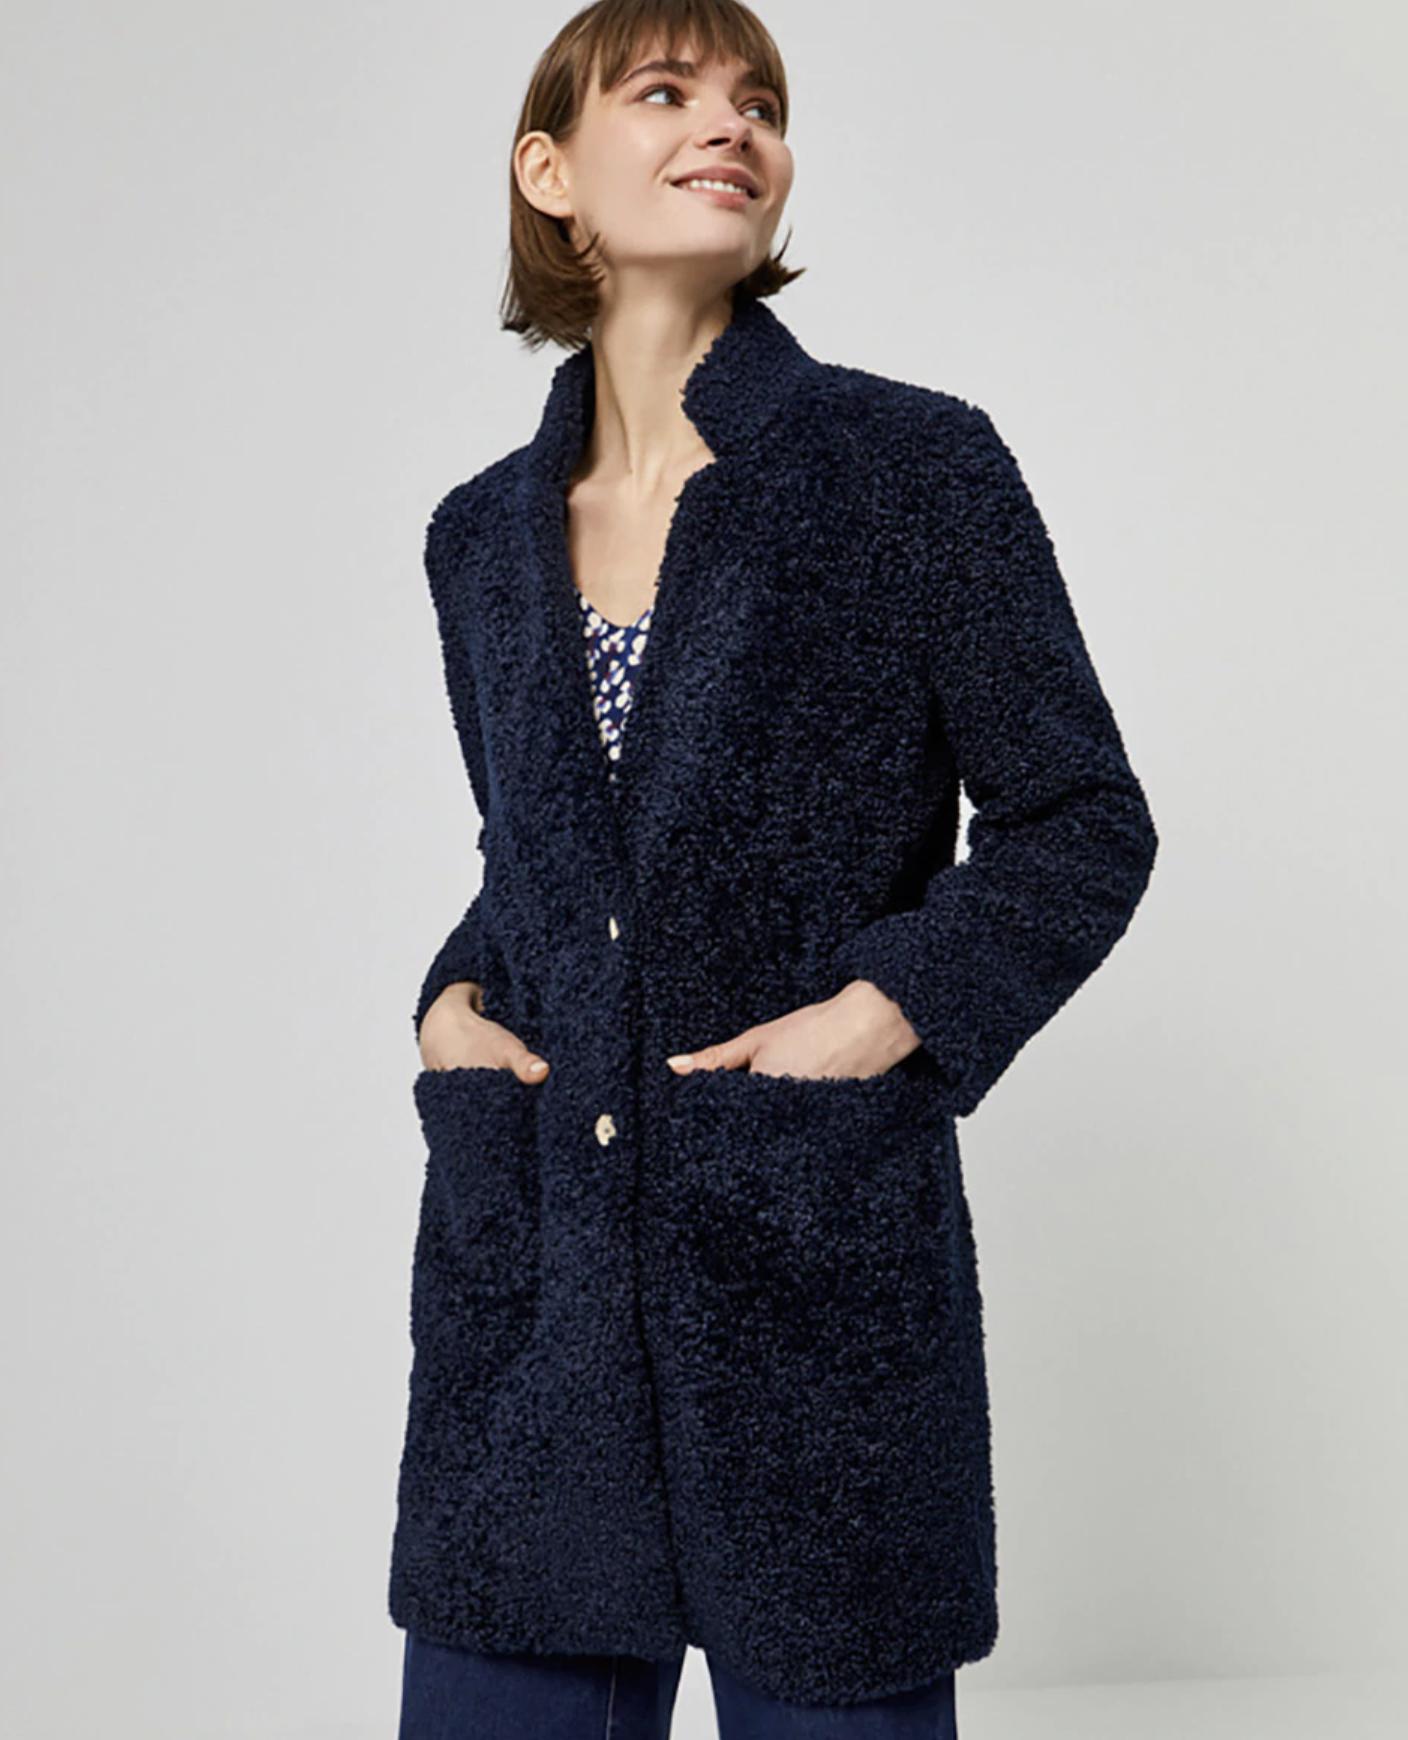 Abrigo de mujer de borrego con bolsillos plastrón